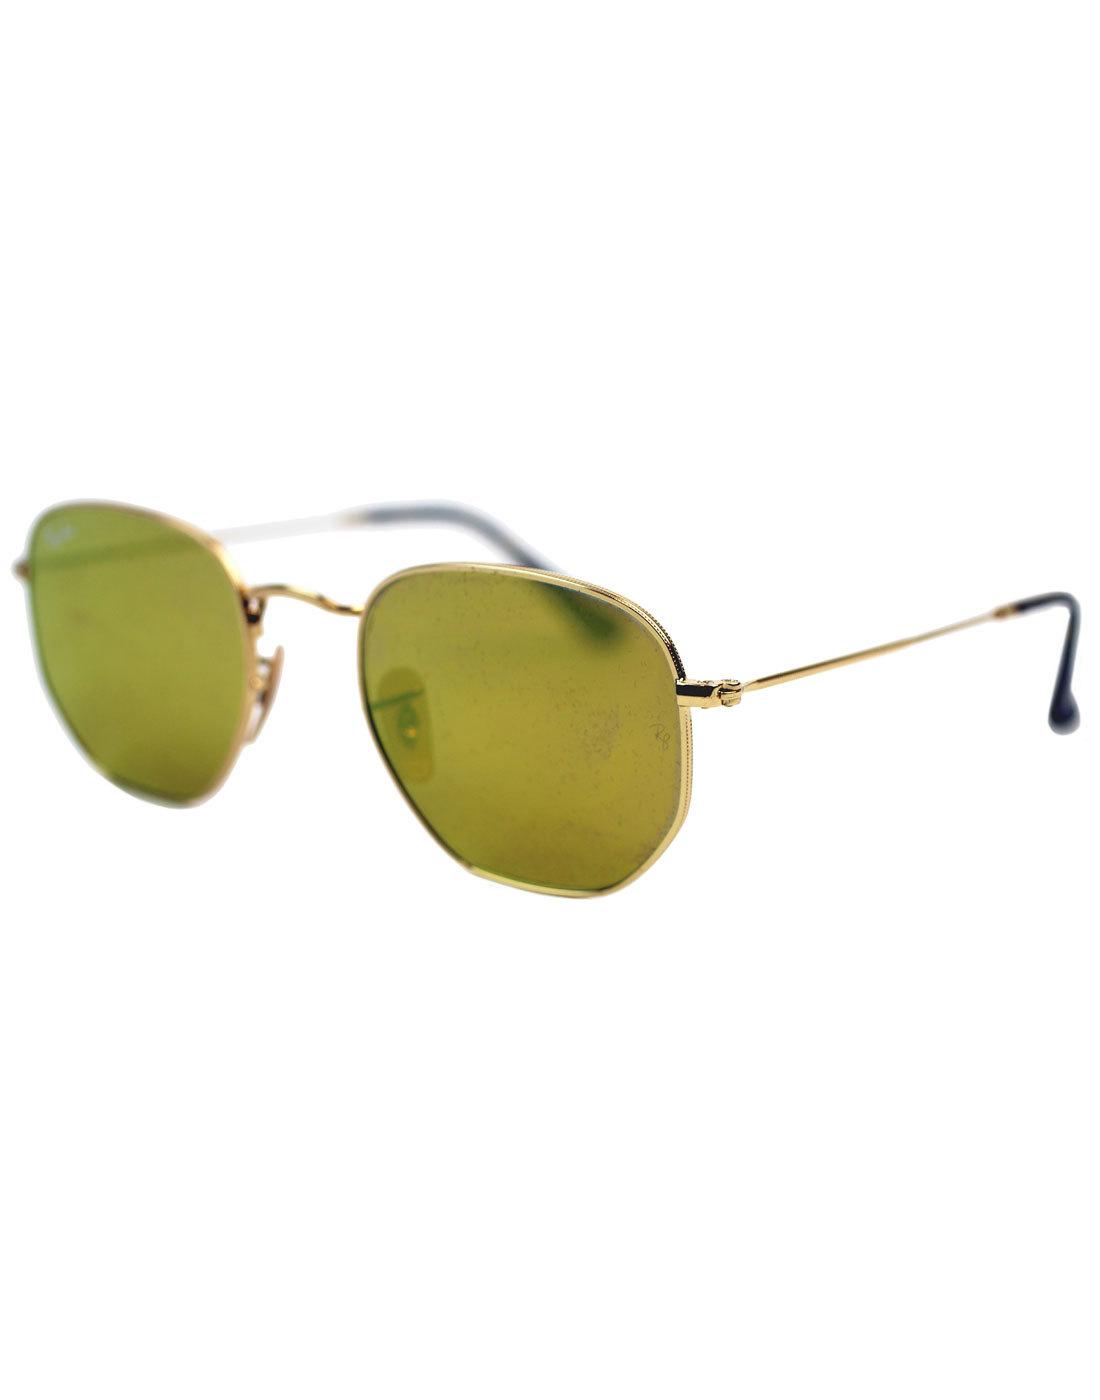 Hexagonal Round RAY-BAN Mod Gold Flash Sunglasses